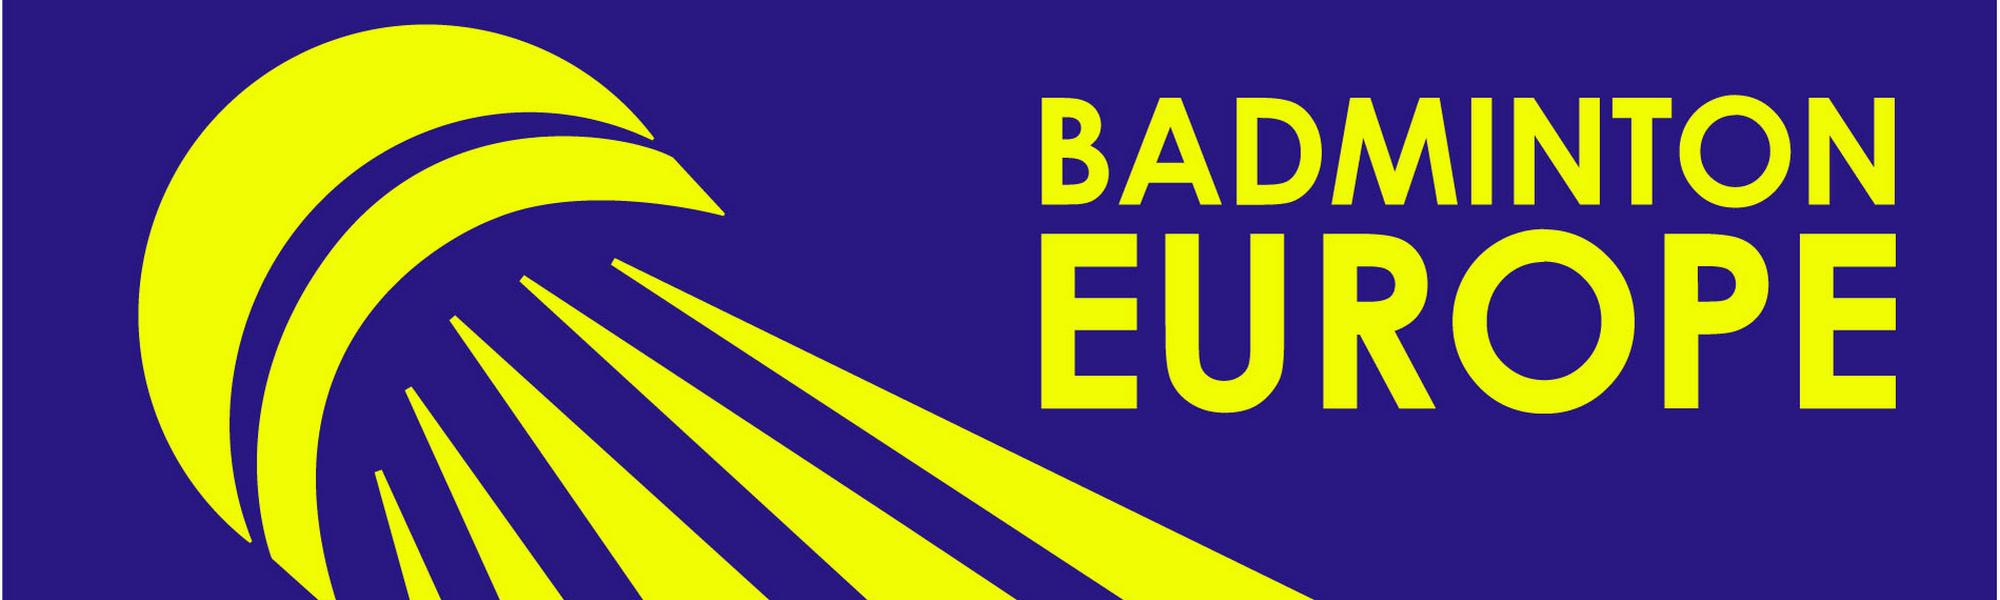 Badminton Europe søger en ny Senior Manager 91fa353f6e50d